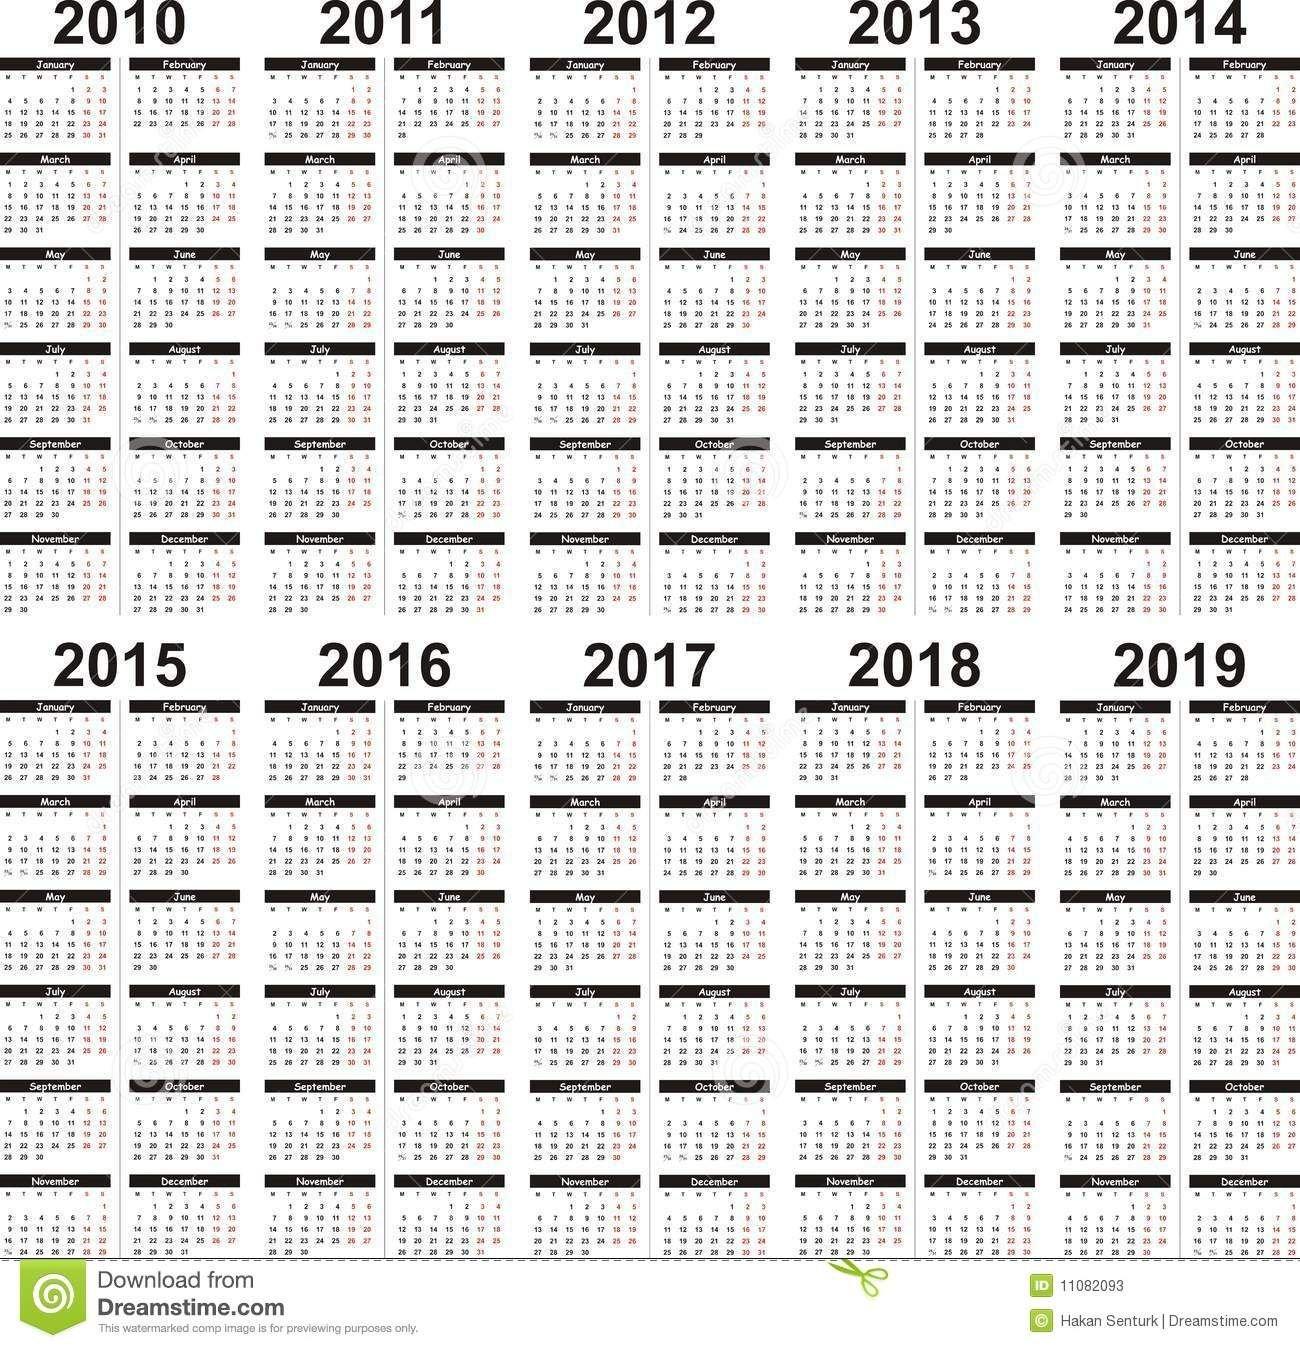 5 Year Calendar (With Images) | 5 Year Calendar, Calendar Printable 5 Year Calendar